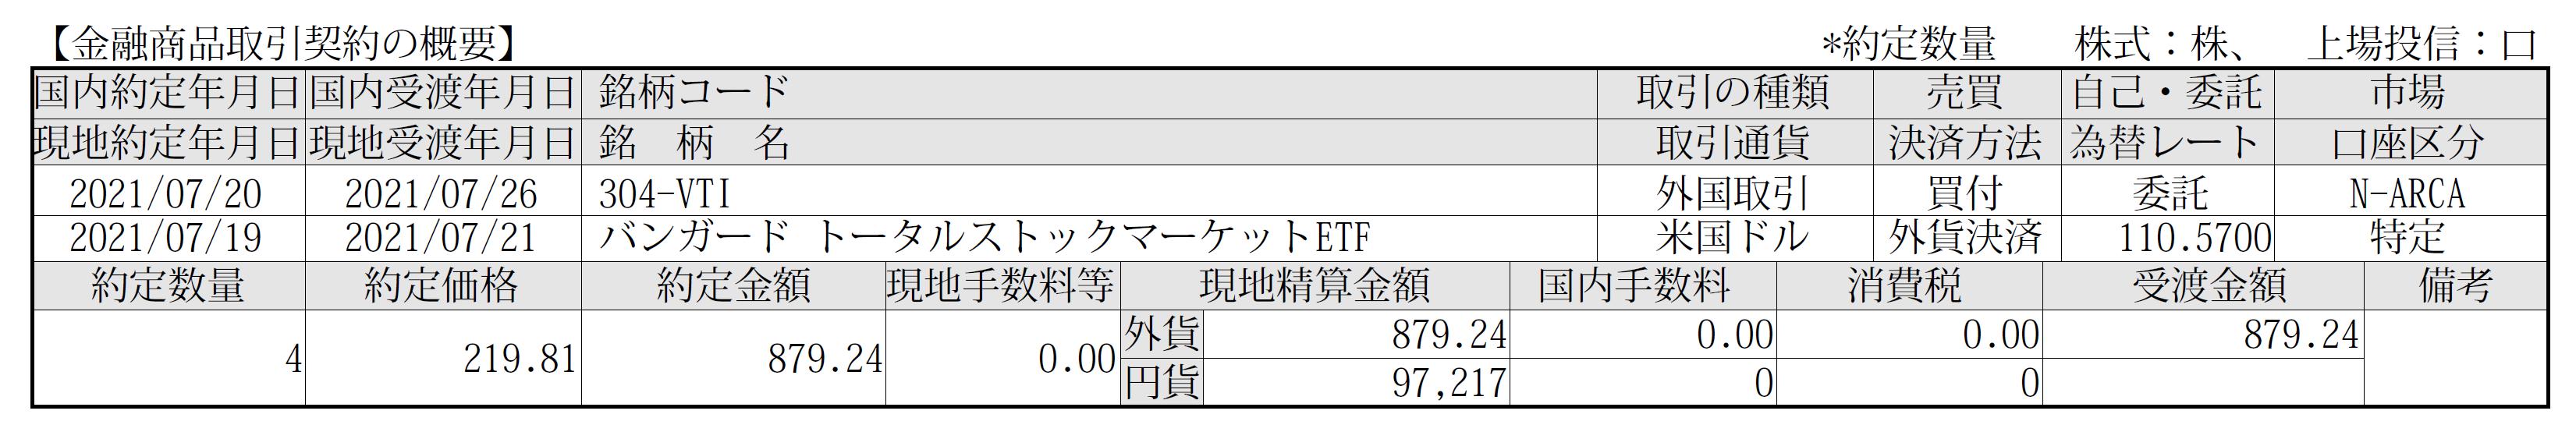 f:id:hodo-work:20210731192125p:plain